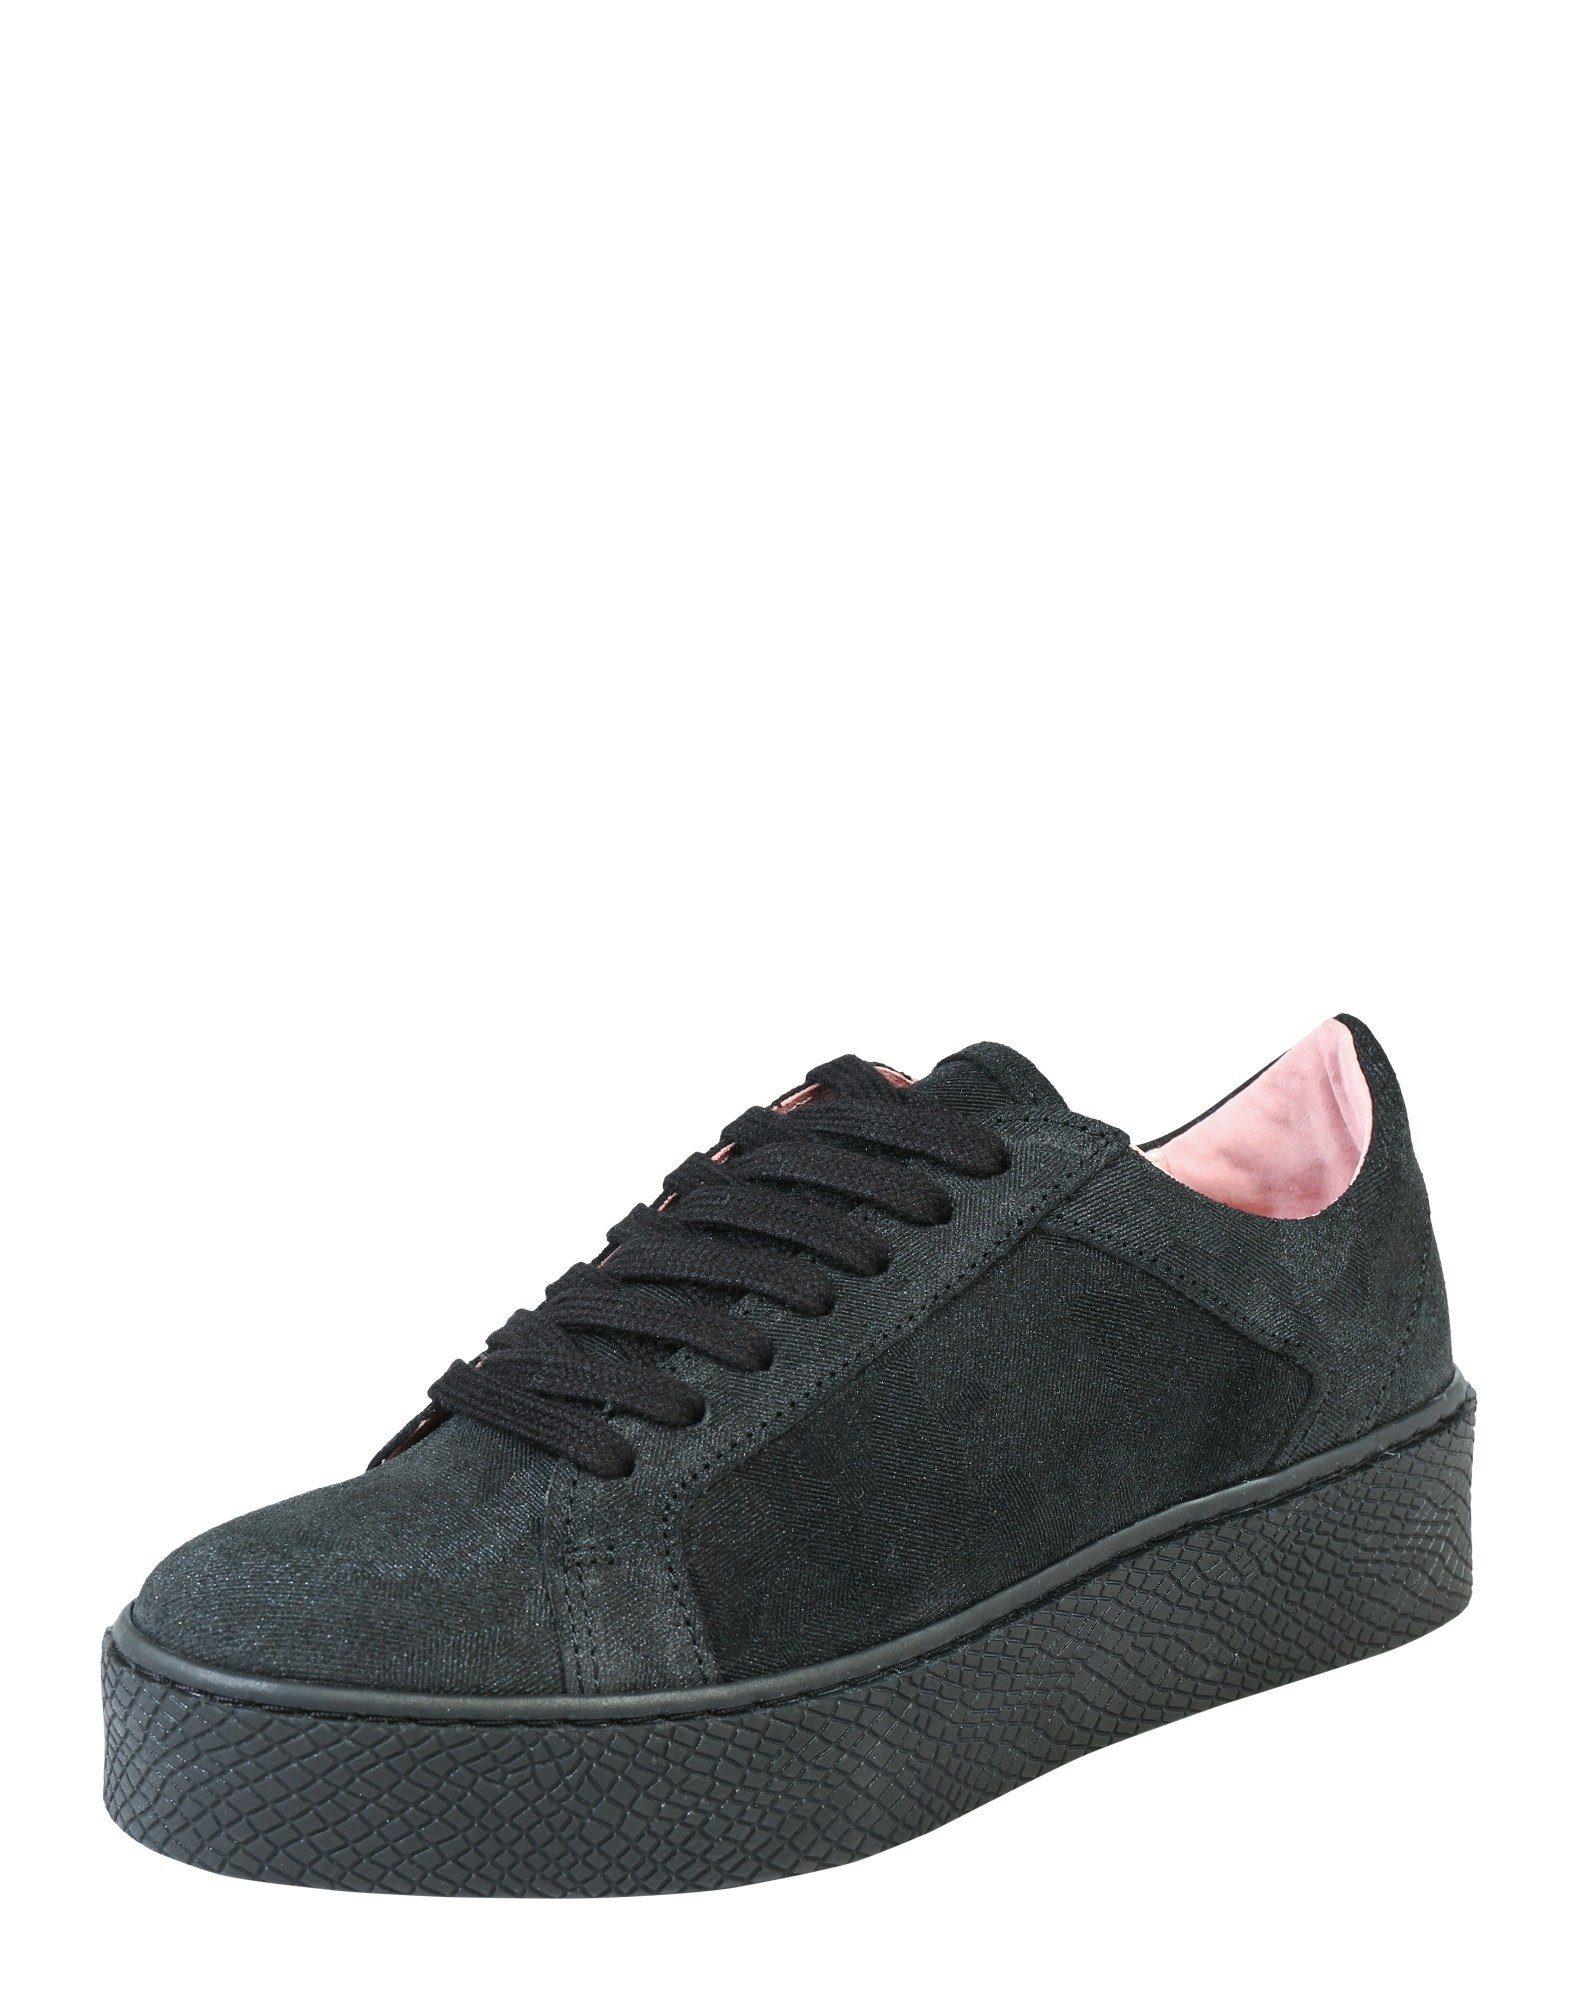 Spm »Soho« Sneaker, schwarz, schwarz